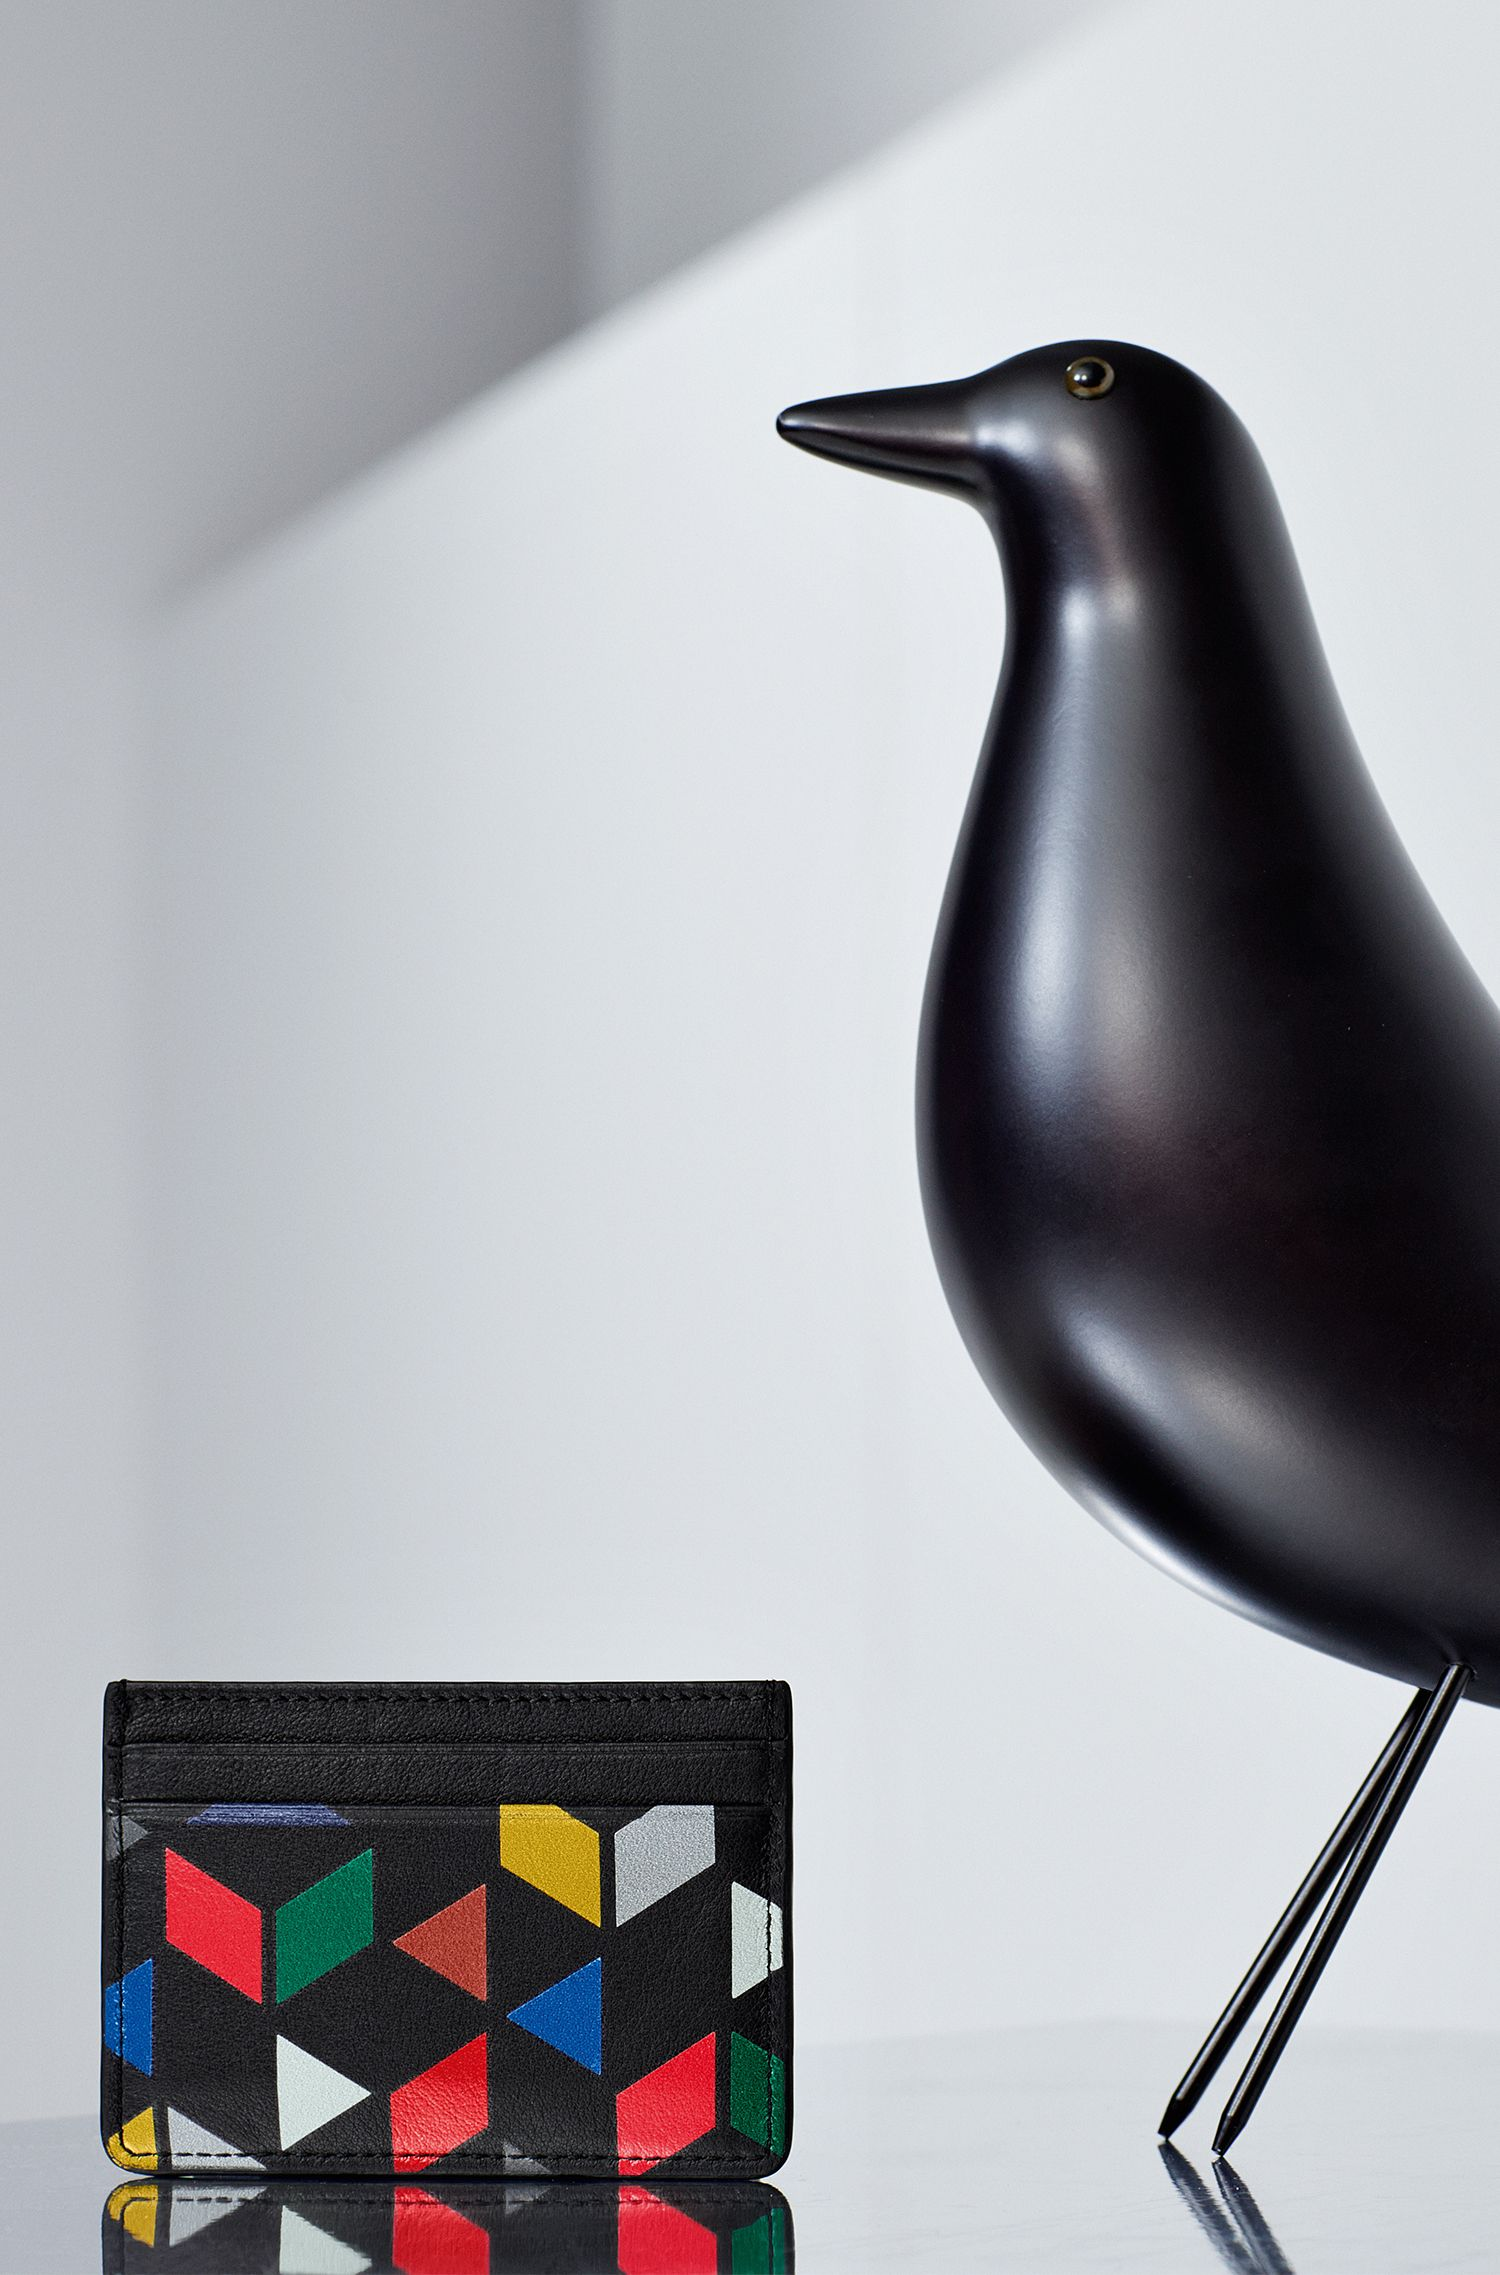 An Eames Celebration printed card holder